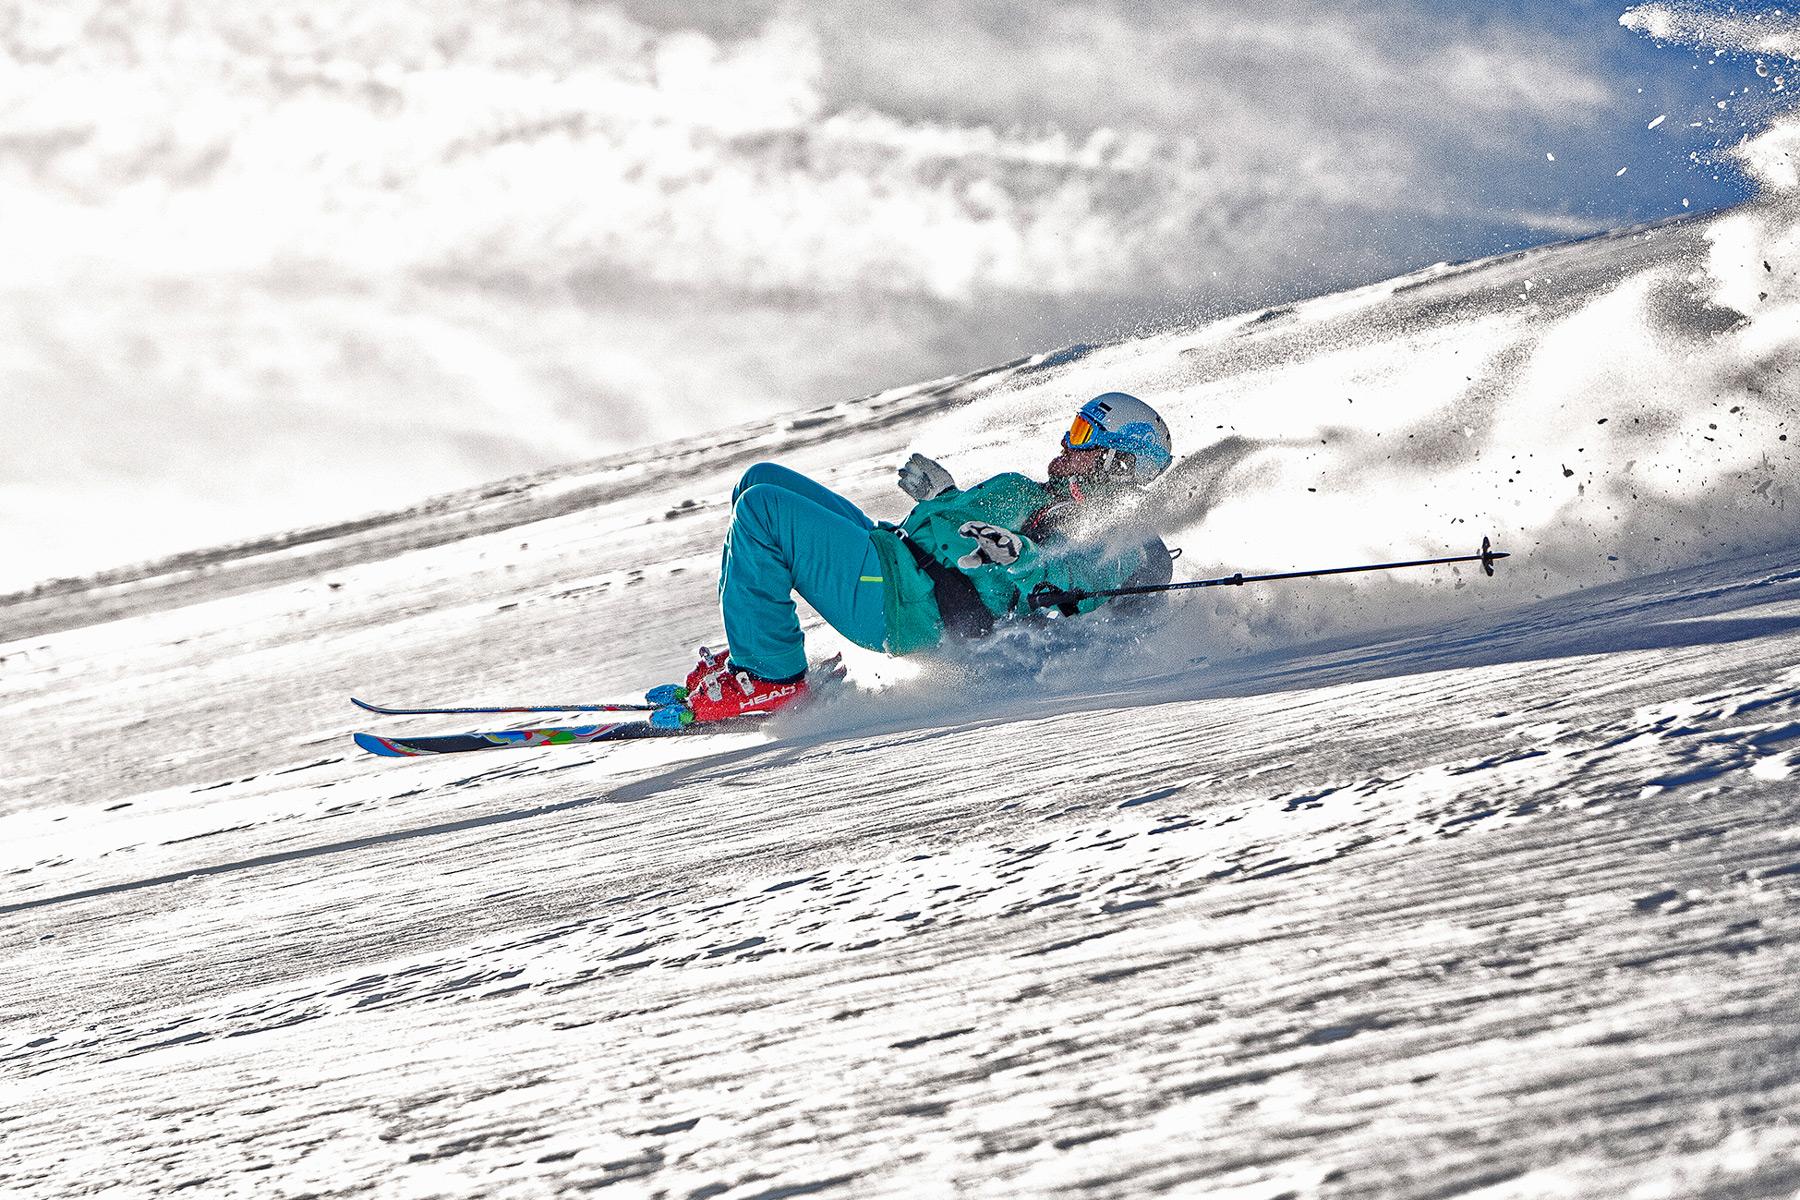 15-Pyua-Dachstein-Ski-Action-Christoph-Gramann